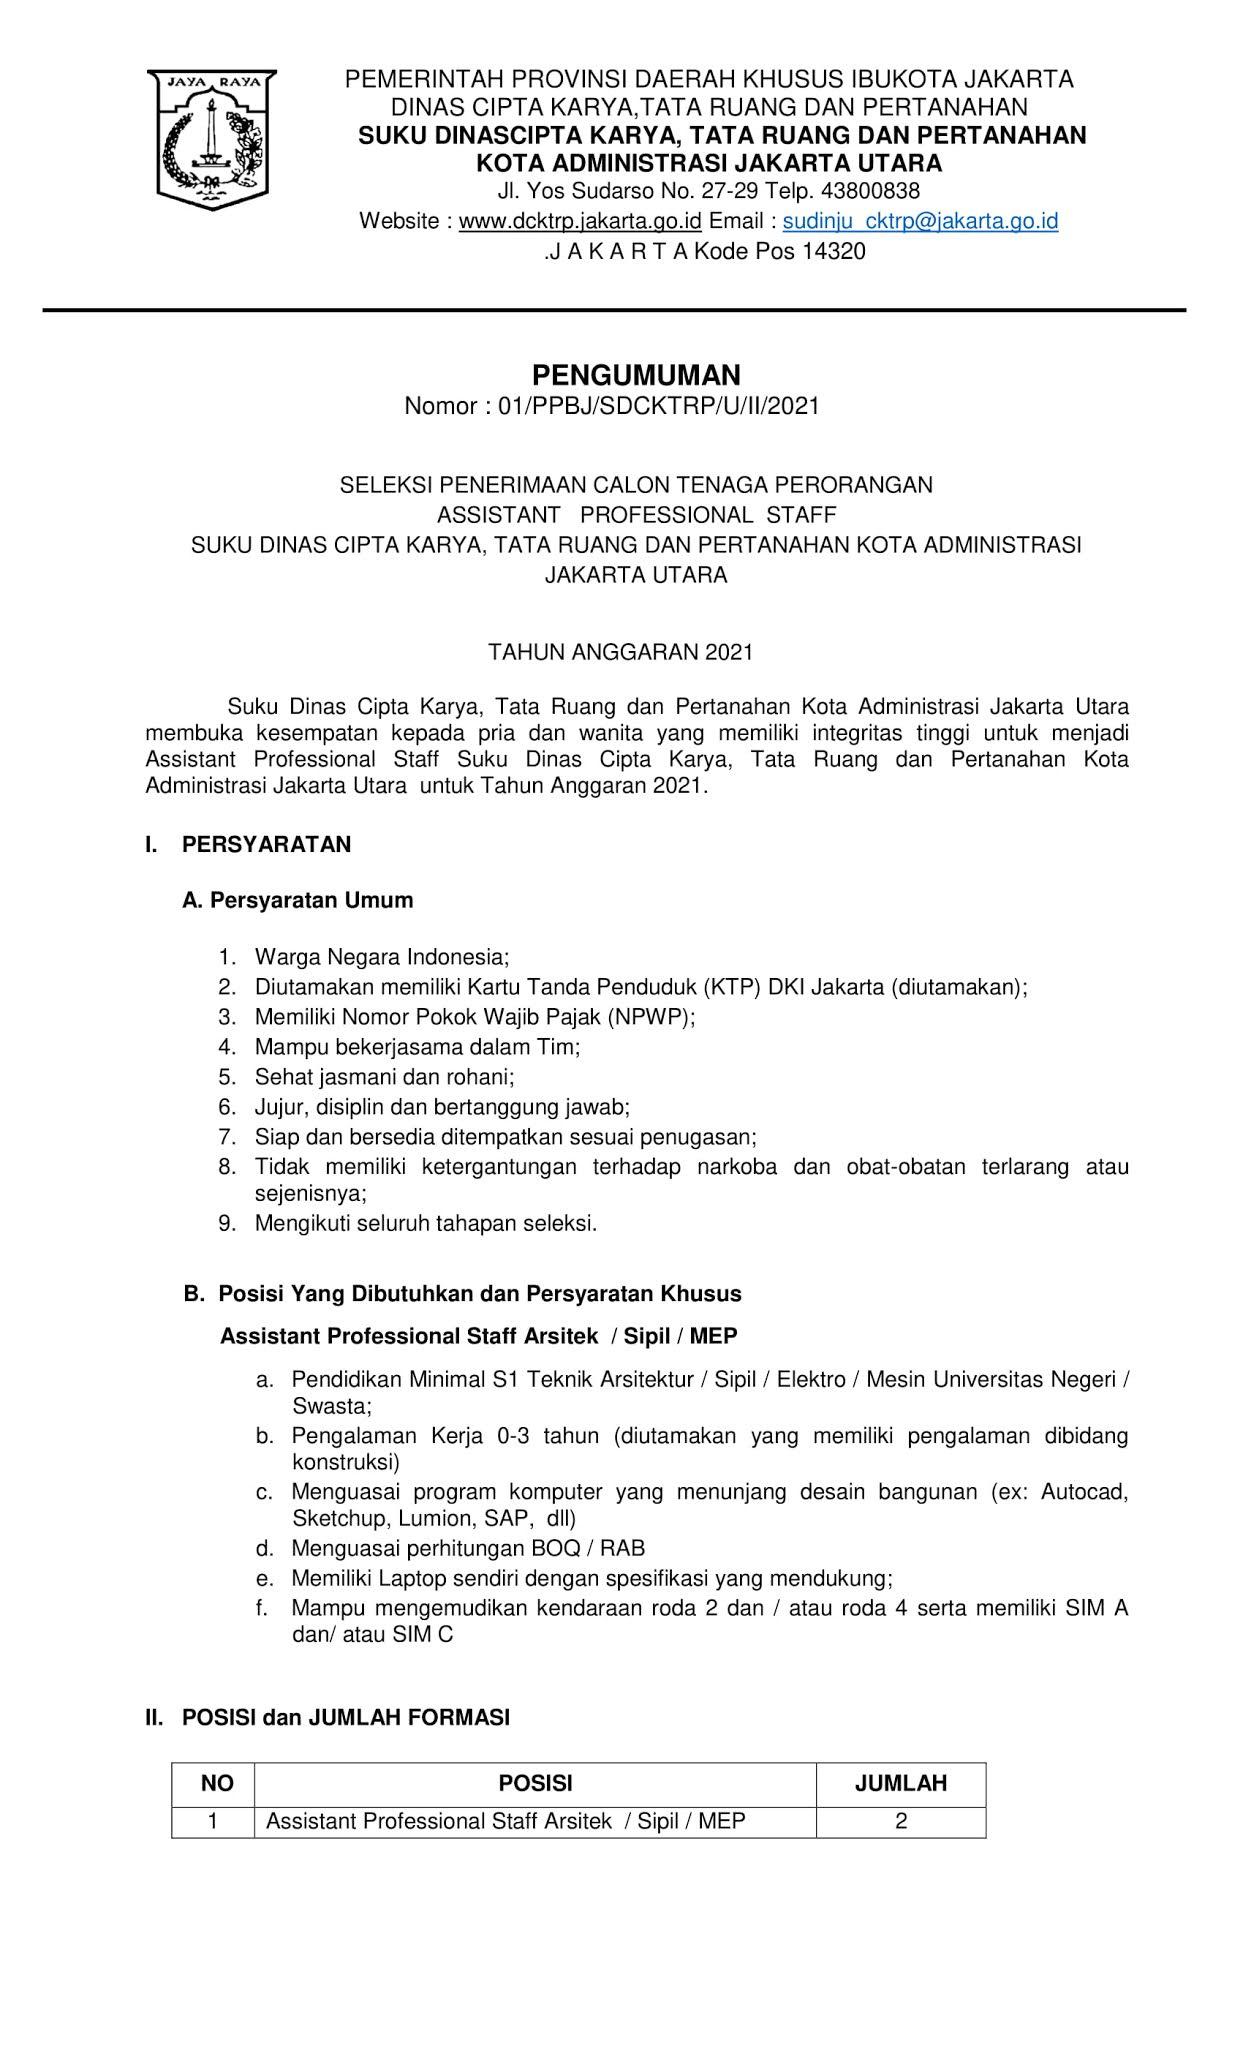 Lowongan Kerja Dinas Cipta Karya Tata Ruang dan Pertanahan Februari 2021